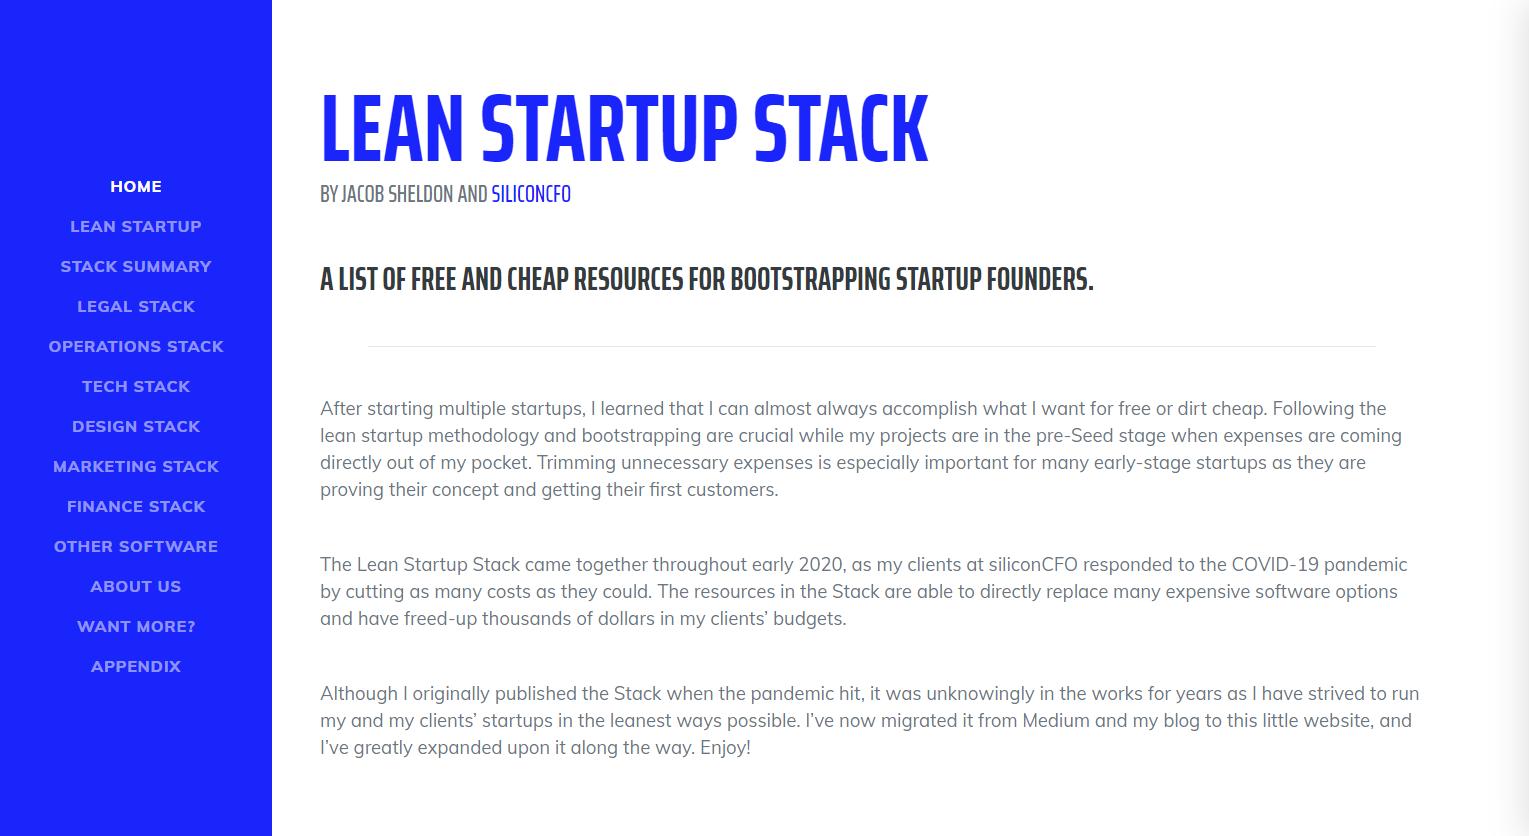 Lean Startup Stack